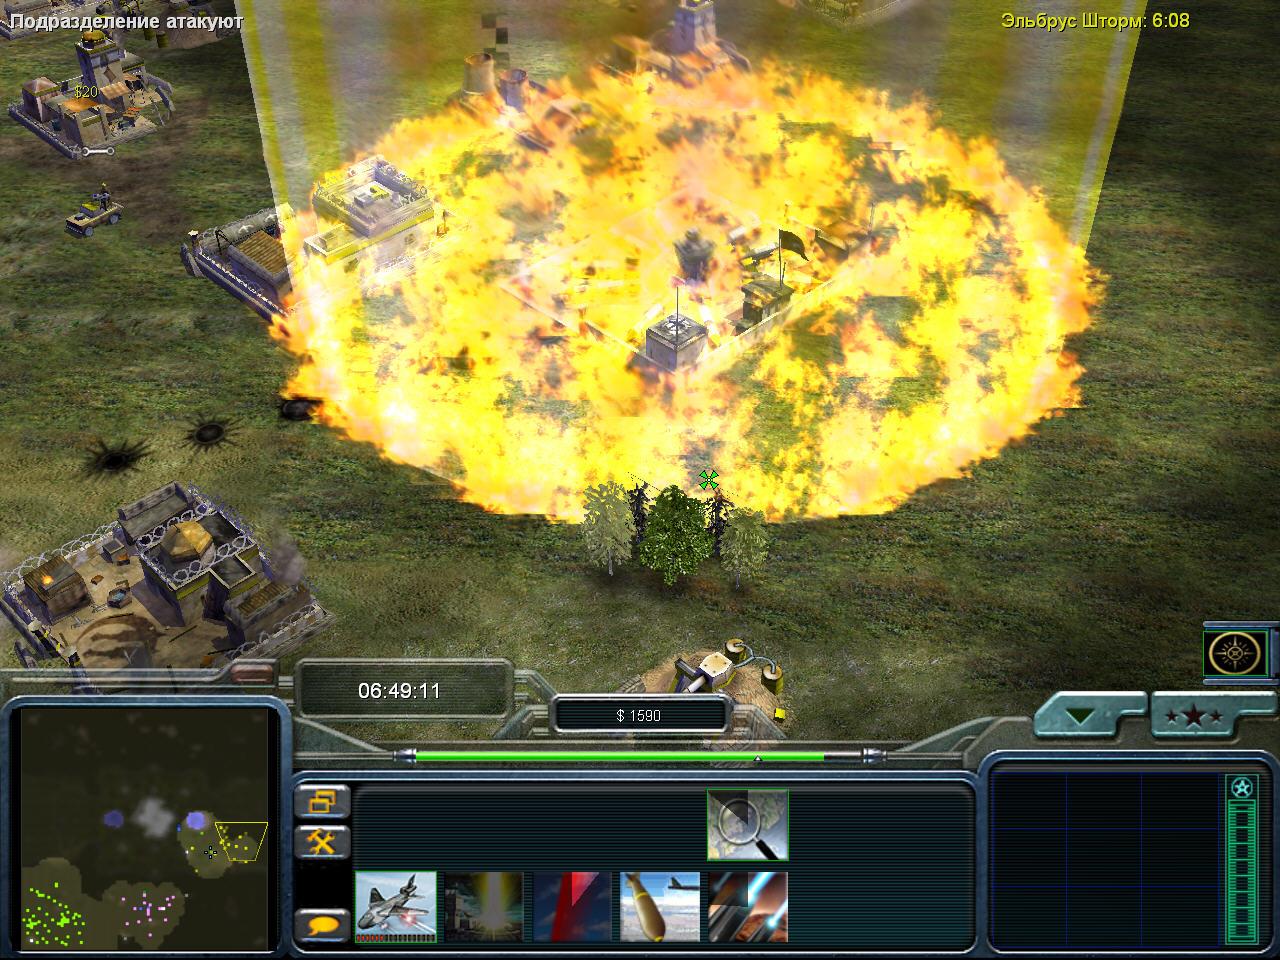 Contra mod for cc generals zero hour, cyber dozer, image, screenshots, screens, picture, photo, render, concept, art